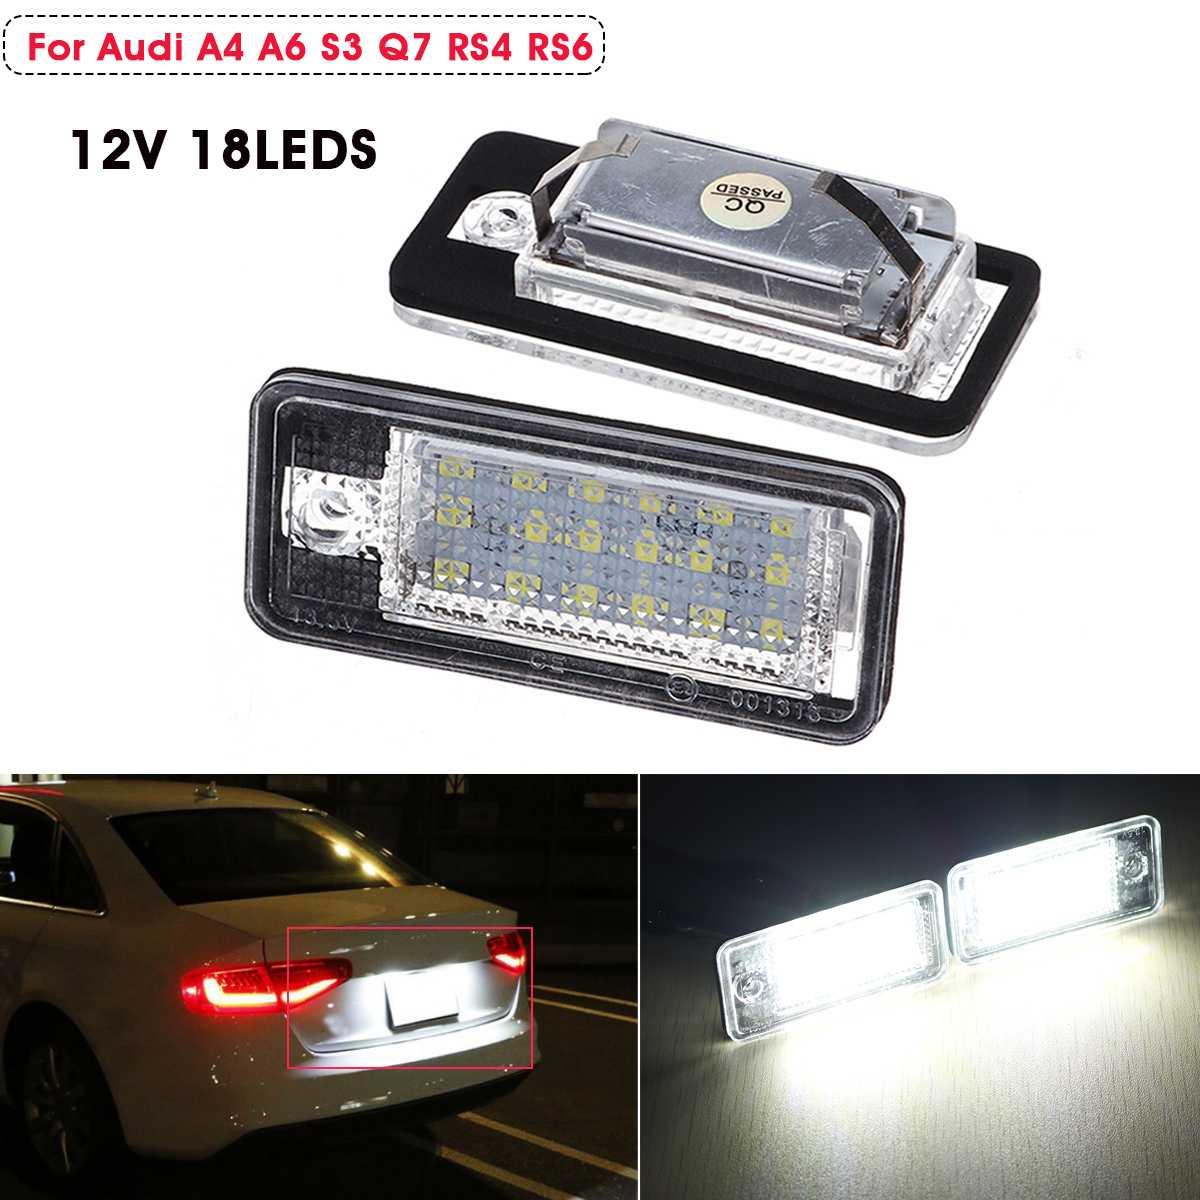 Fits Audi A3 8P 2.0 TDI White 54-SMD LED 12v Side Light Parking Bulbs